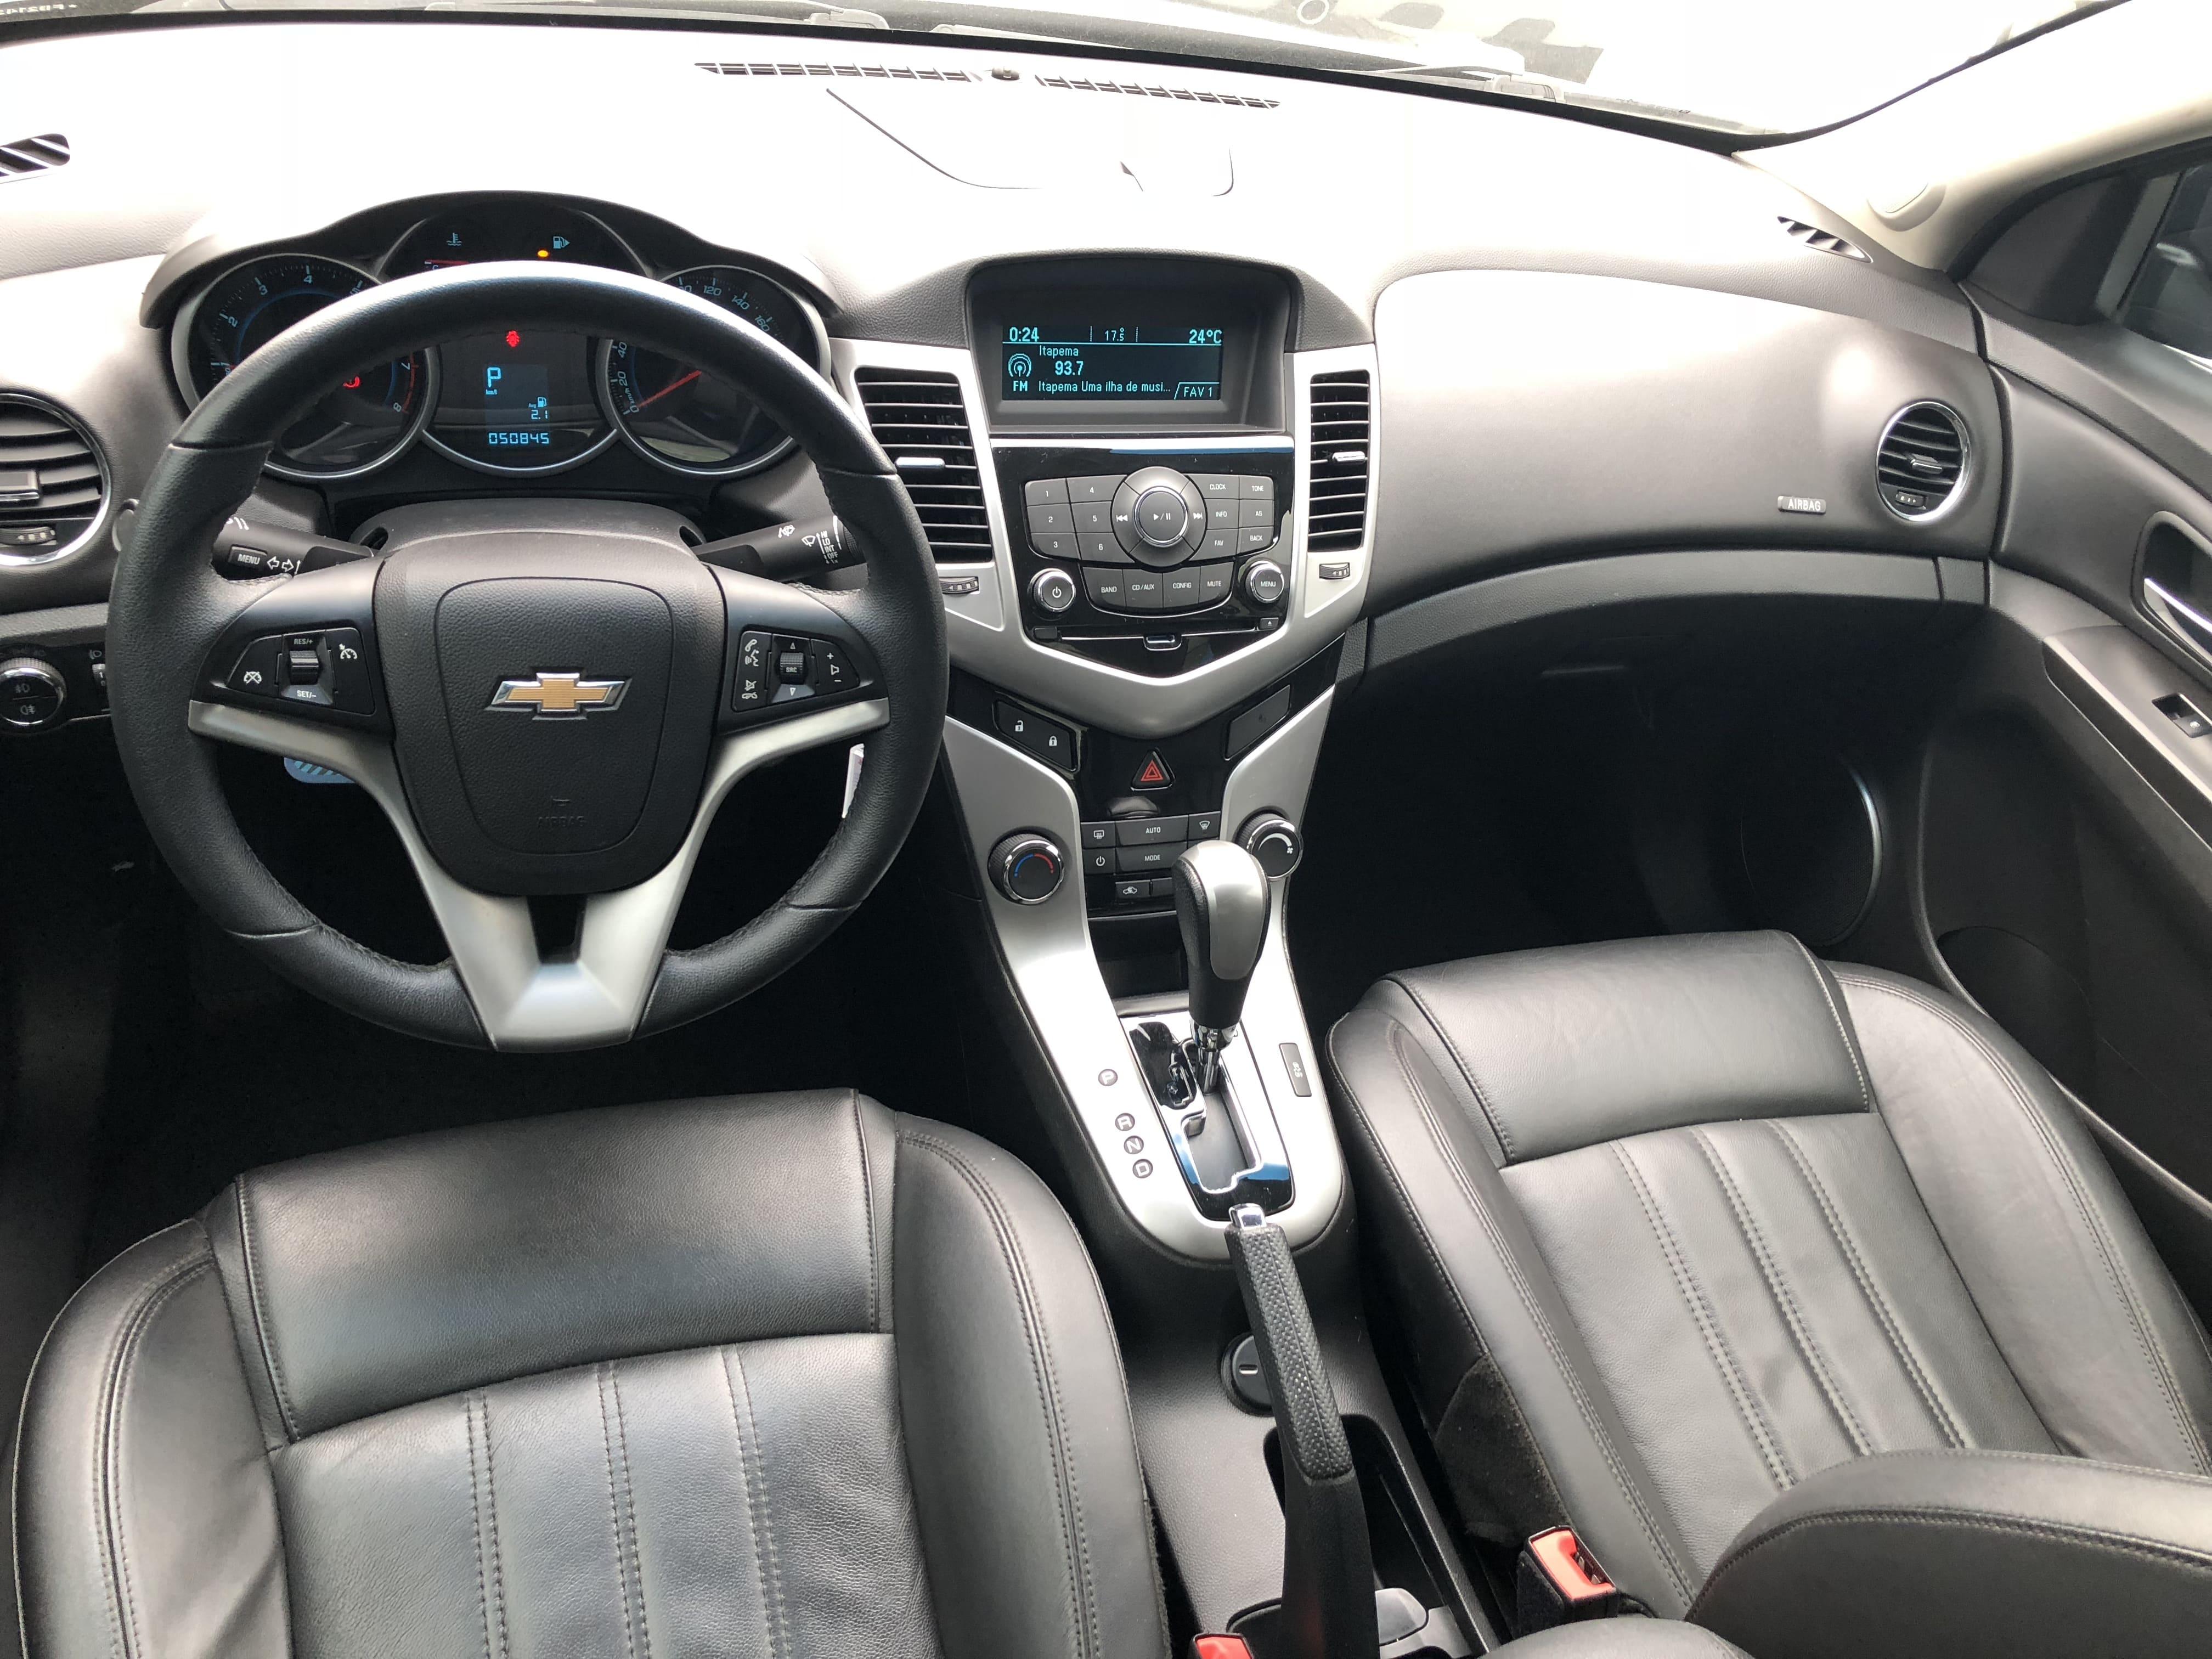 Chevrolet Cruze LT 1.8L 2015